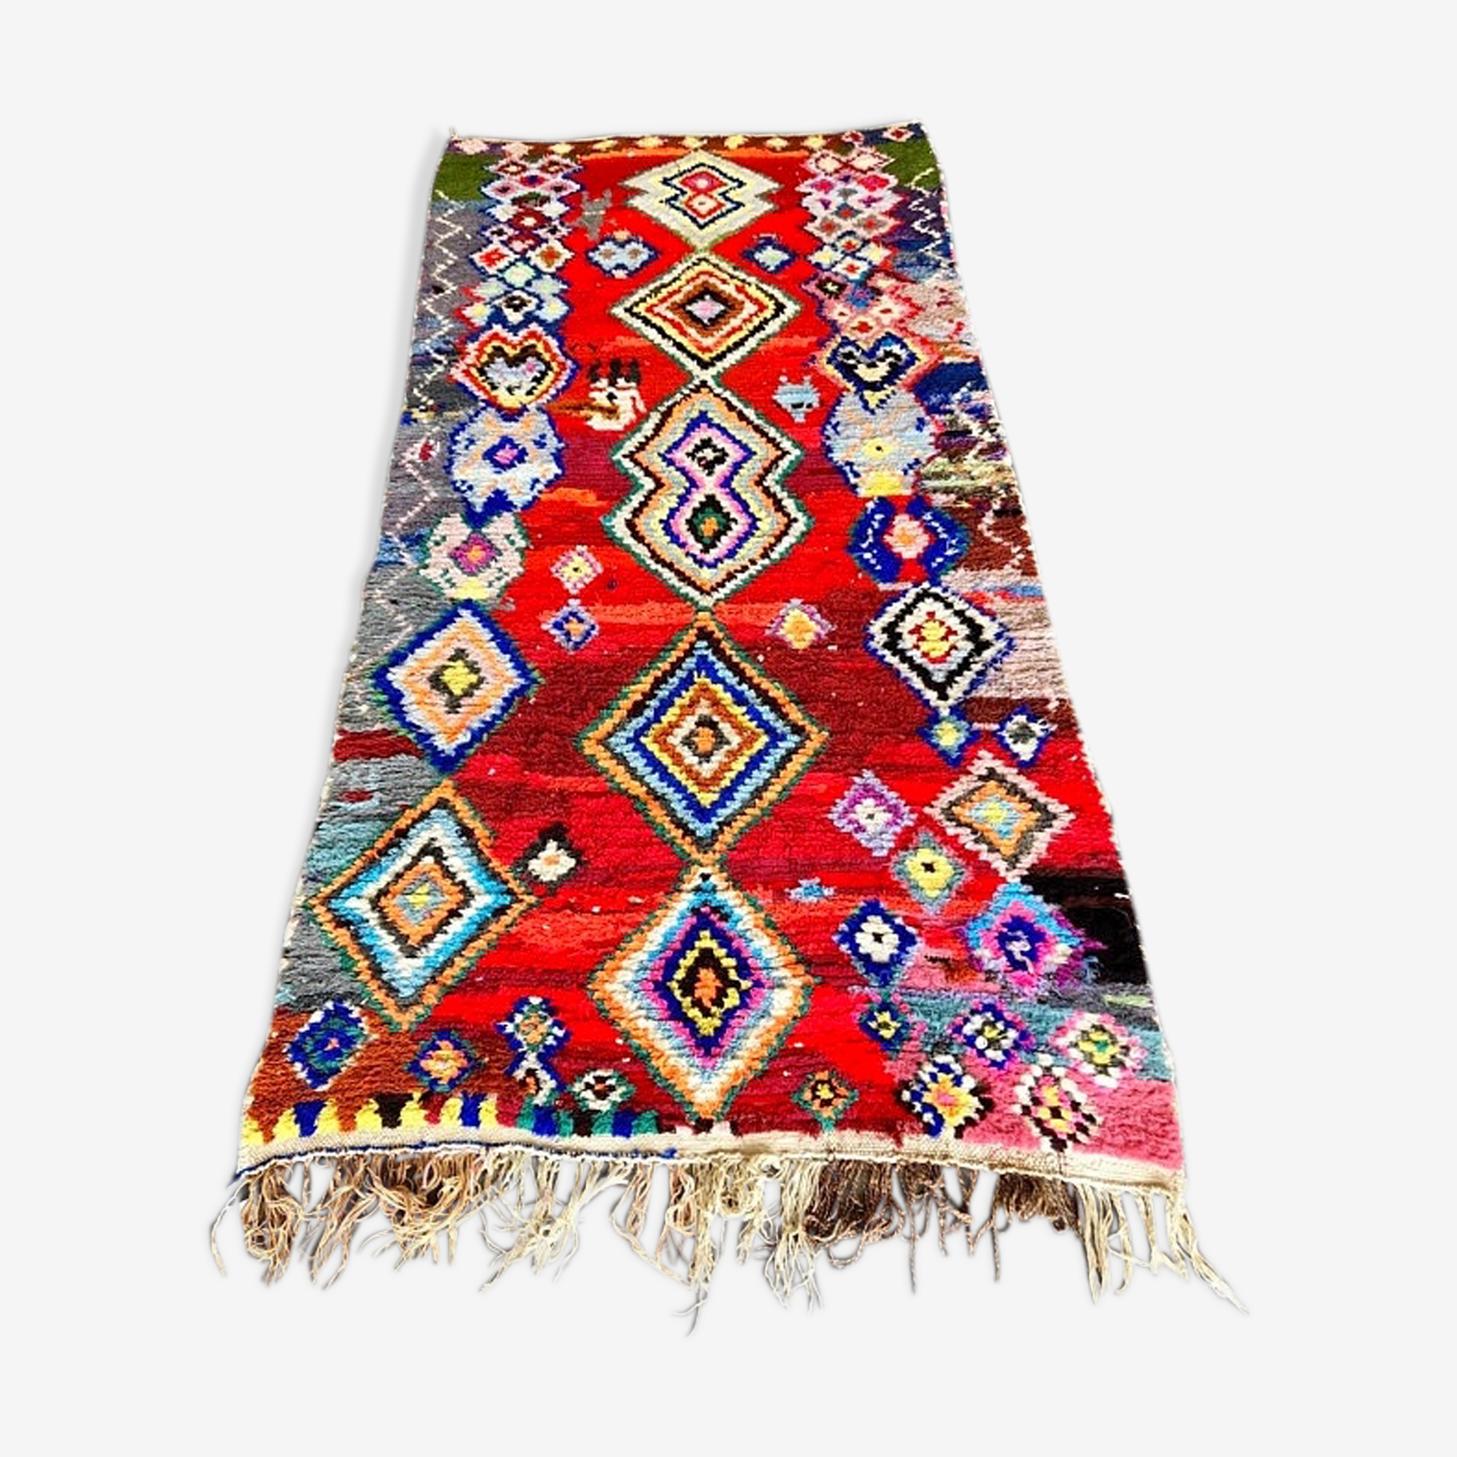 Tapis Berbere Marocain Boucherouite Vintage 155x330 Cm Tissu